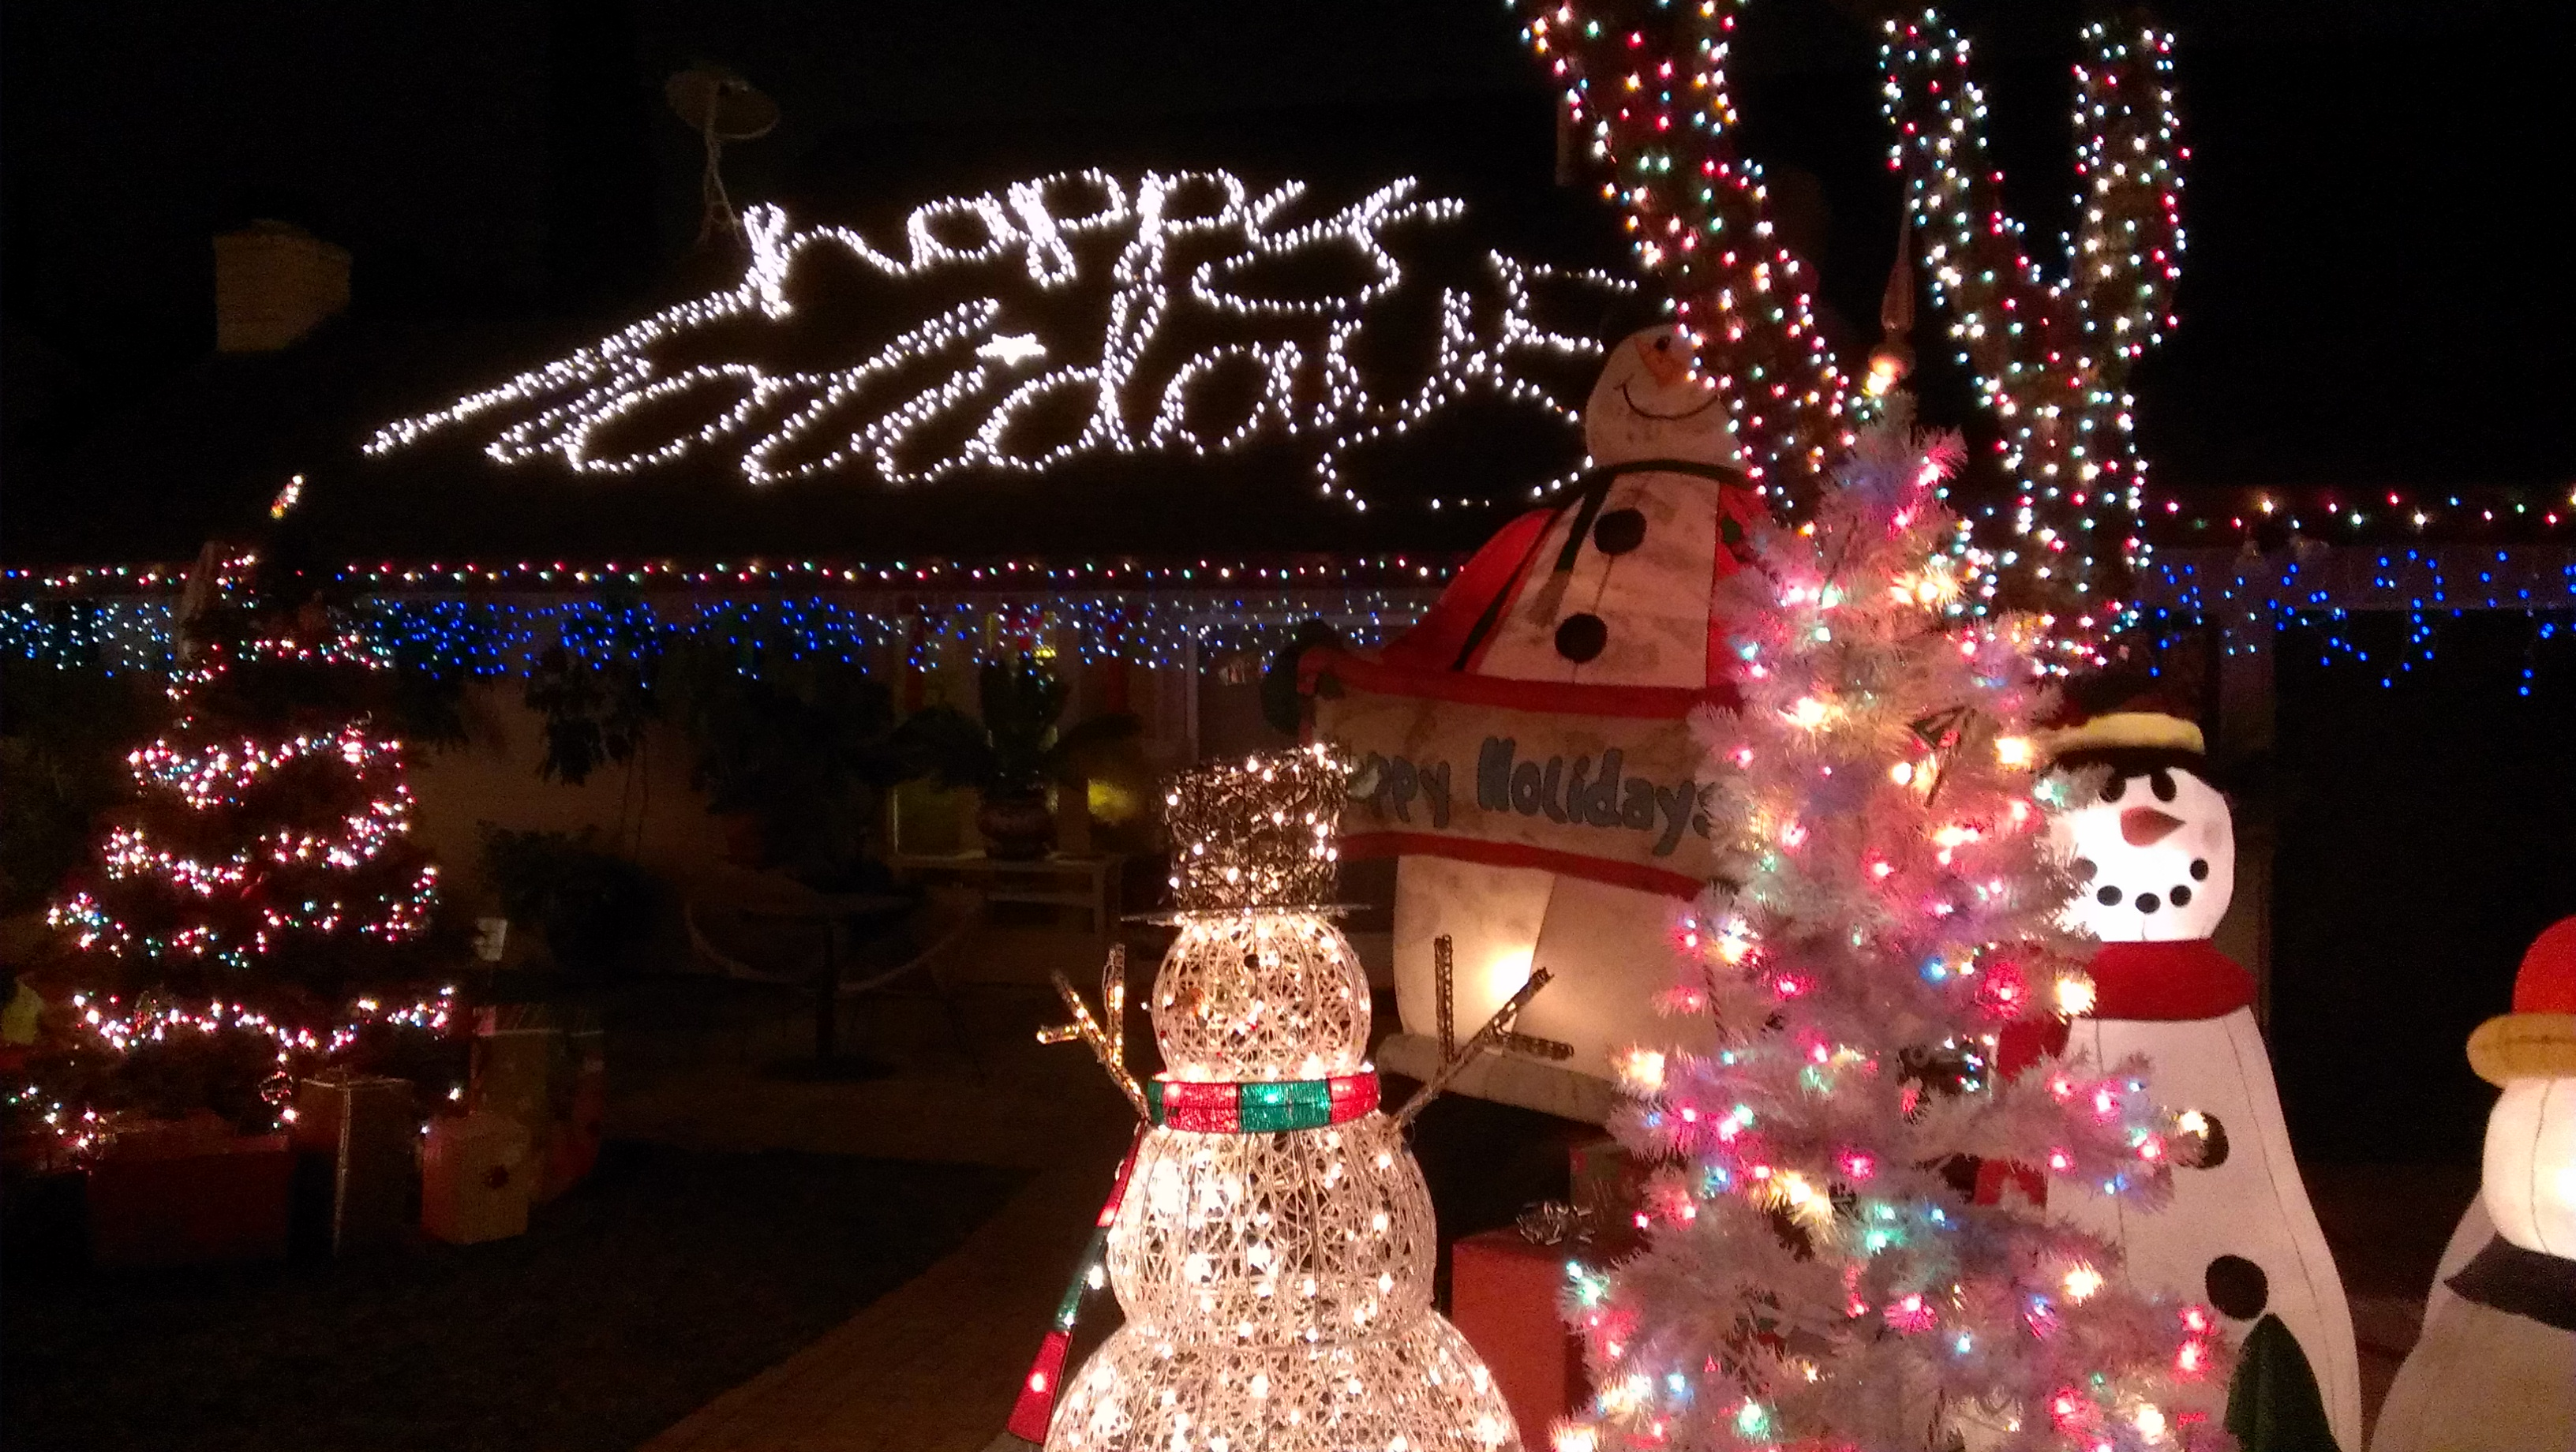 corona candy cane lane - Chino Christmas Lights